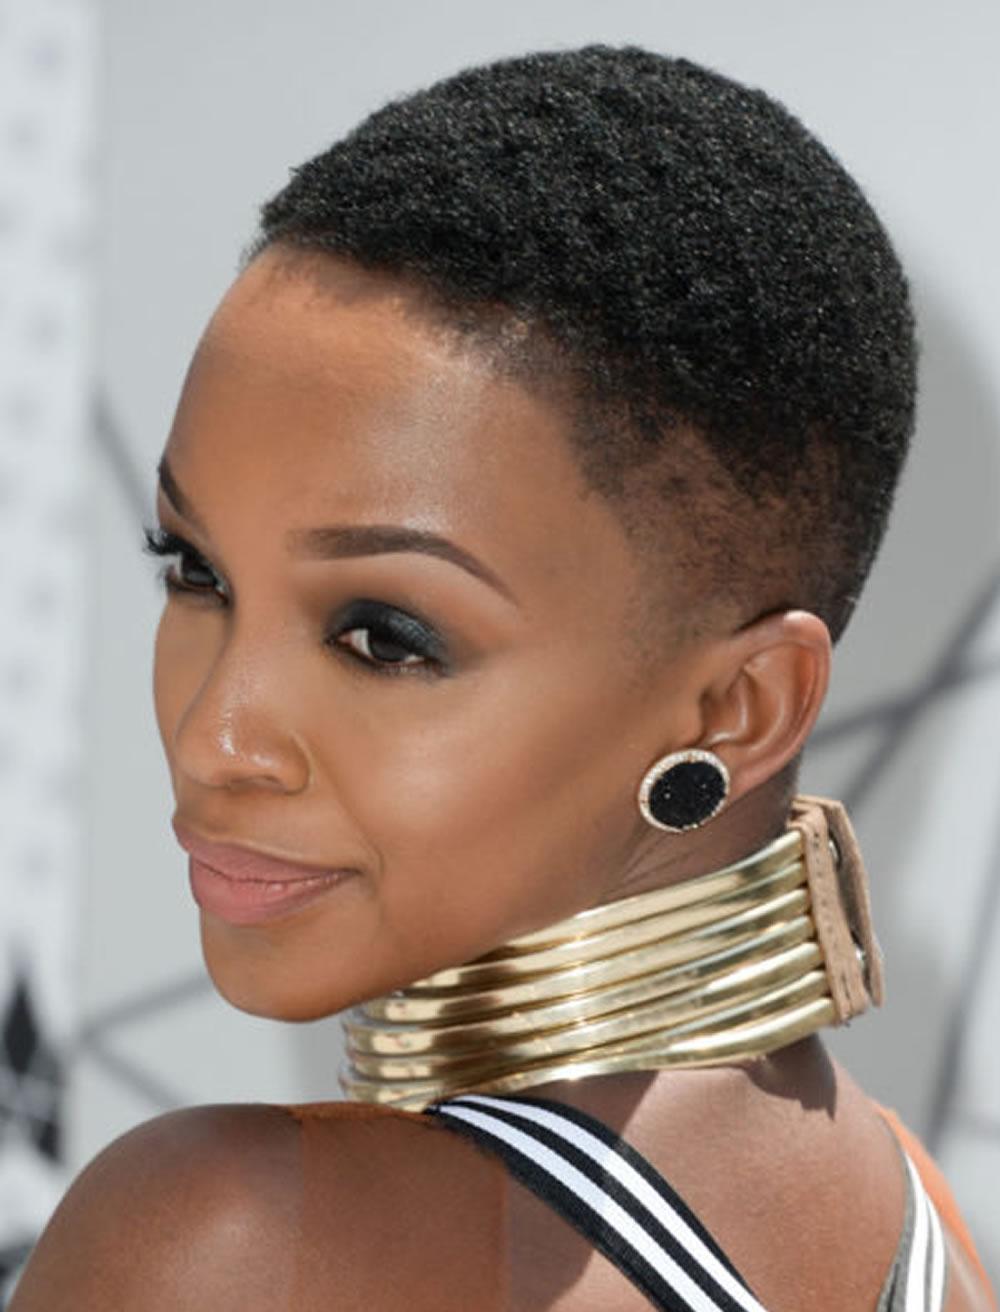 New very short pixie hairstyles 2019-black woman favorite... 4